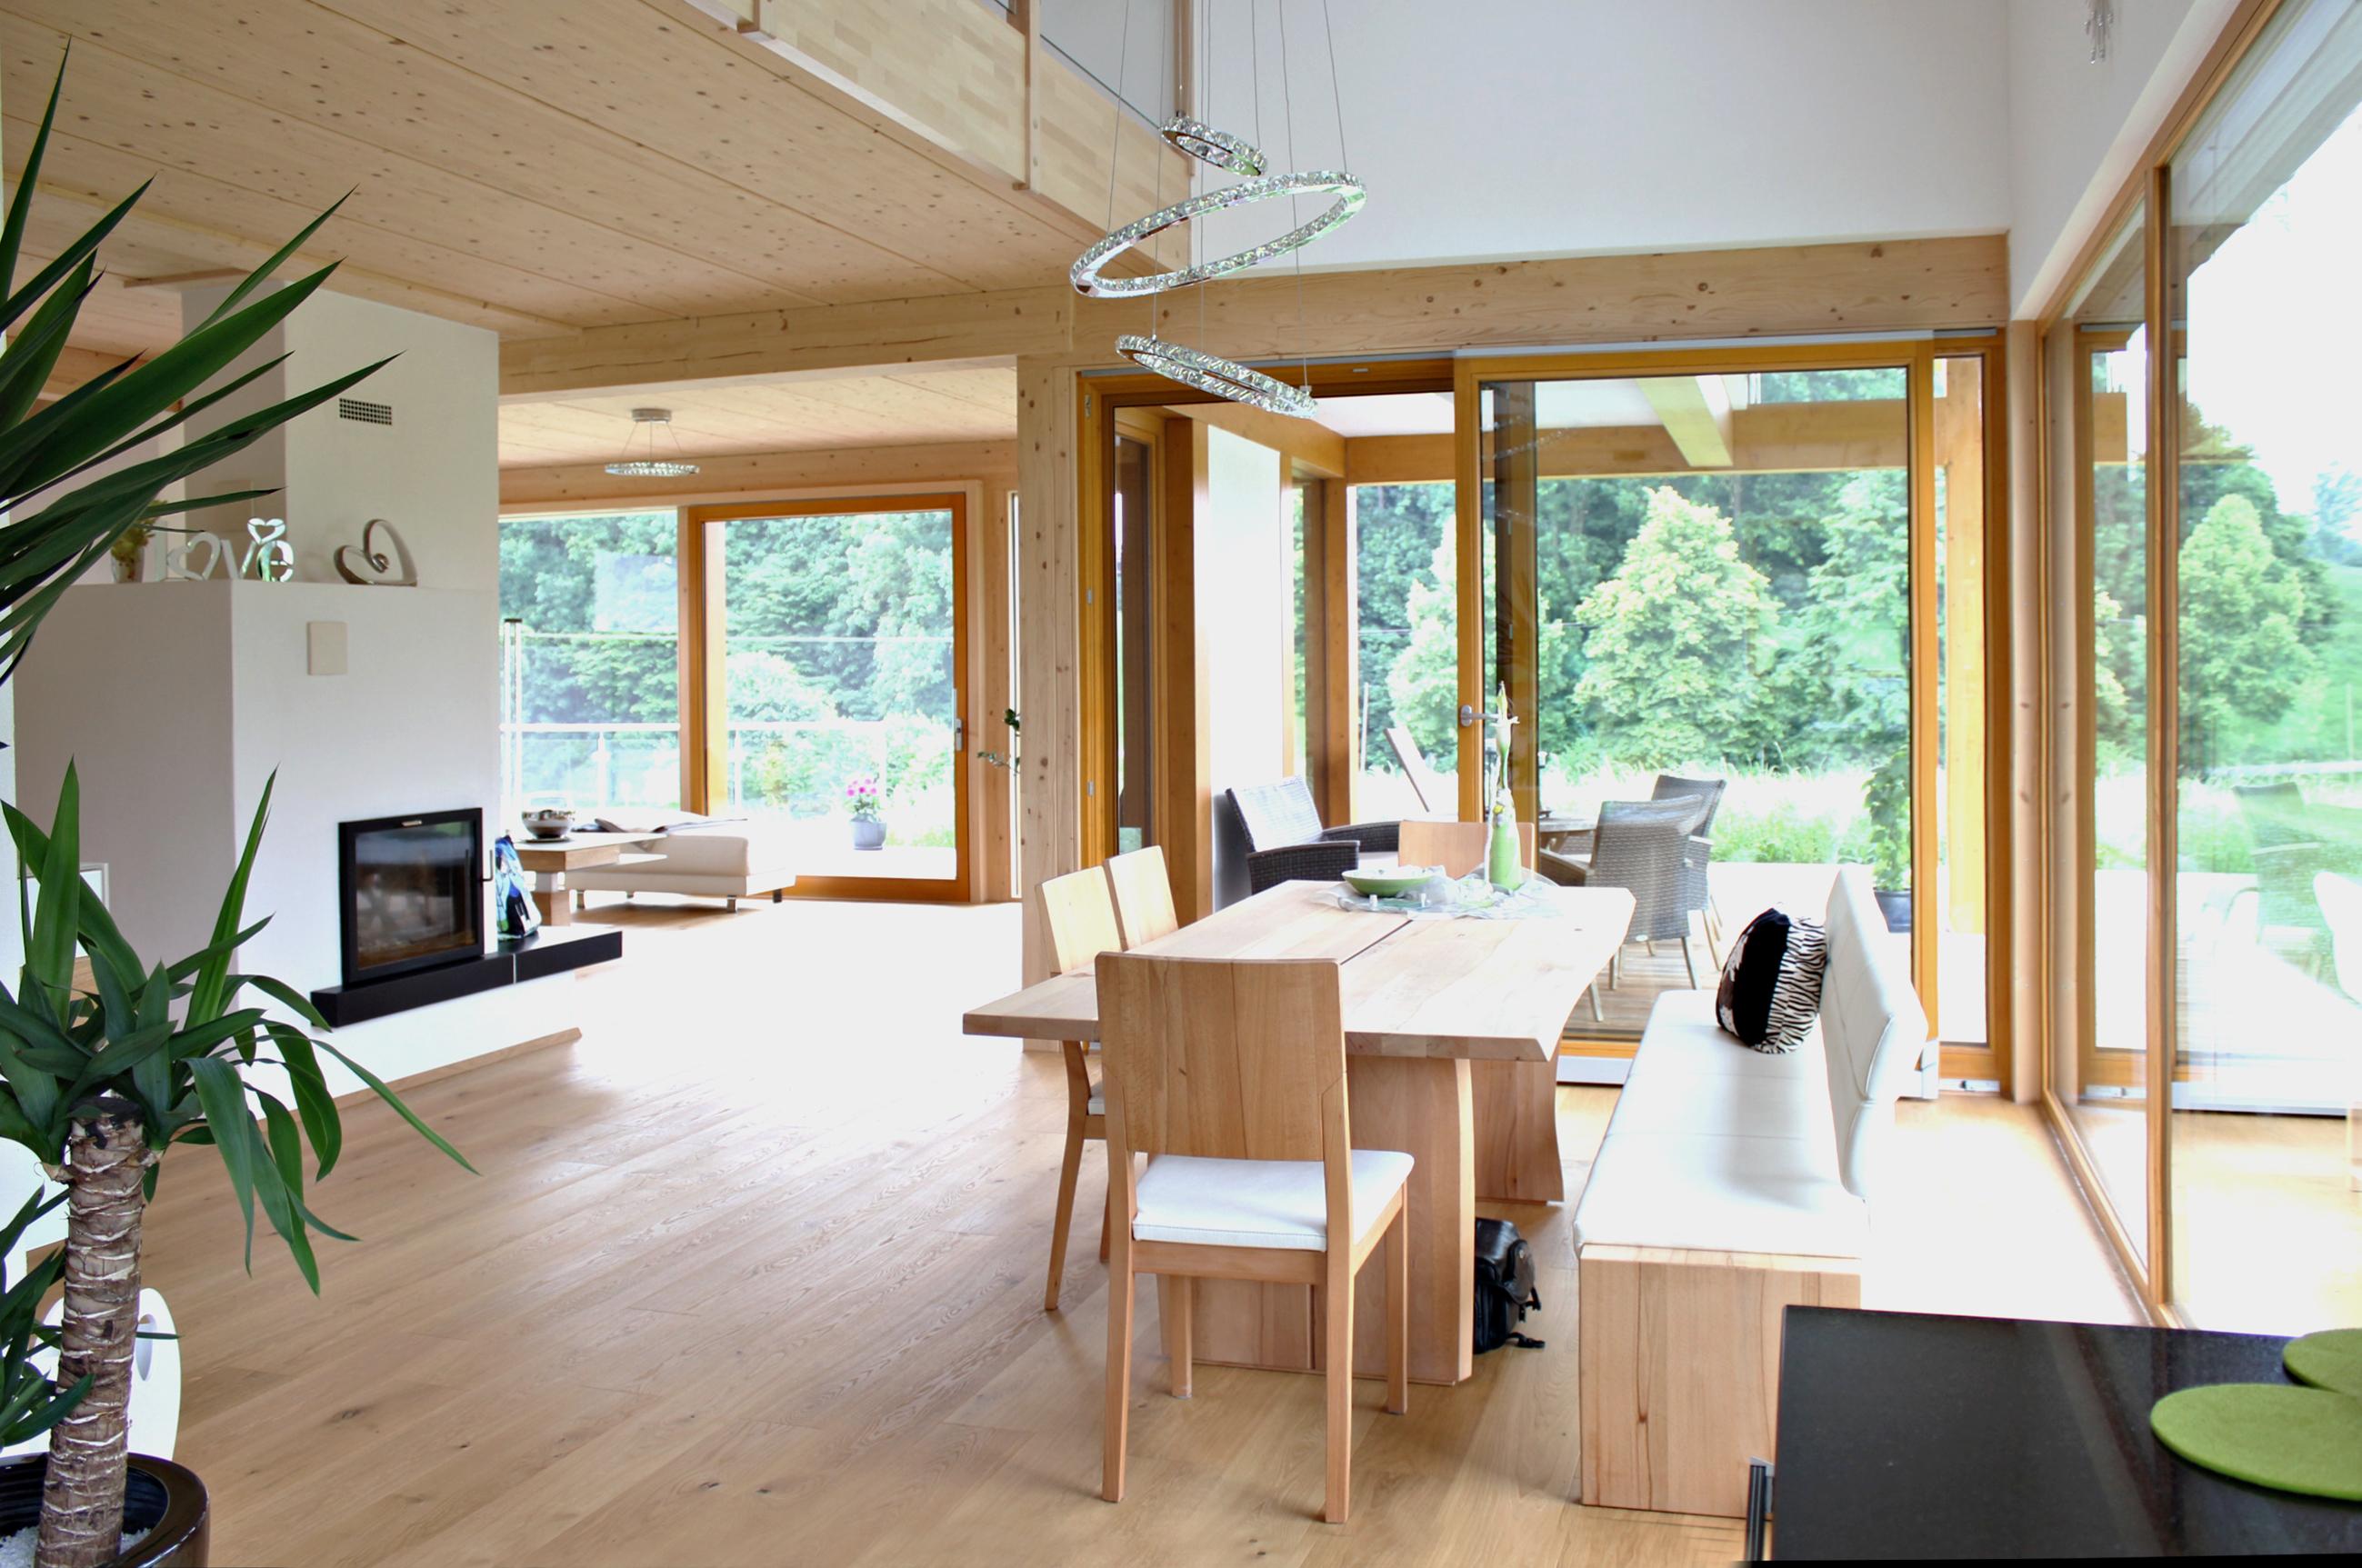 lehner haus fertighausblog architektur. Black Bedroom Furniture Sets. Home Design Ideas